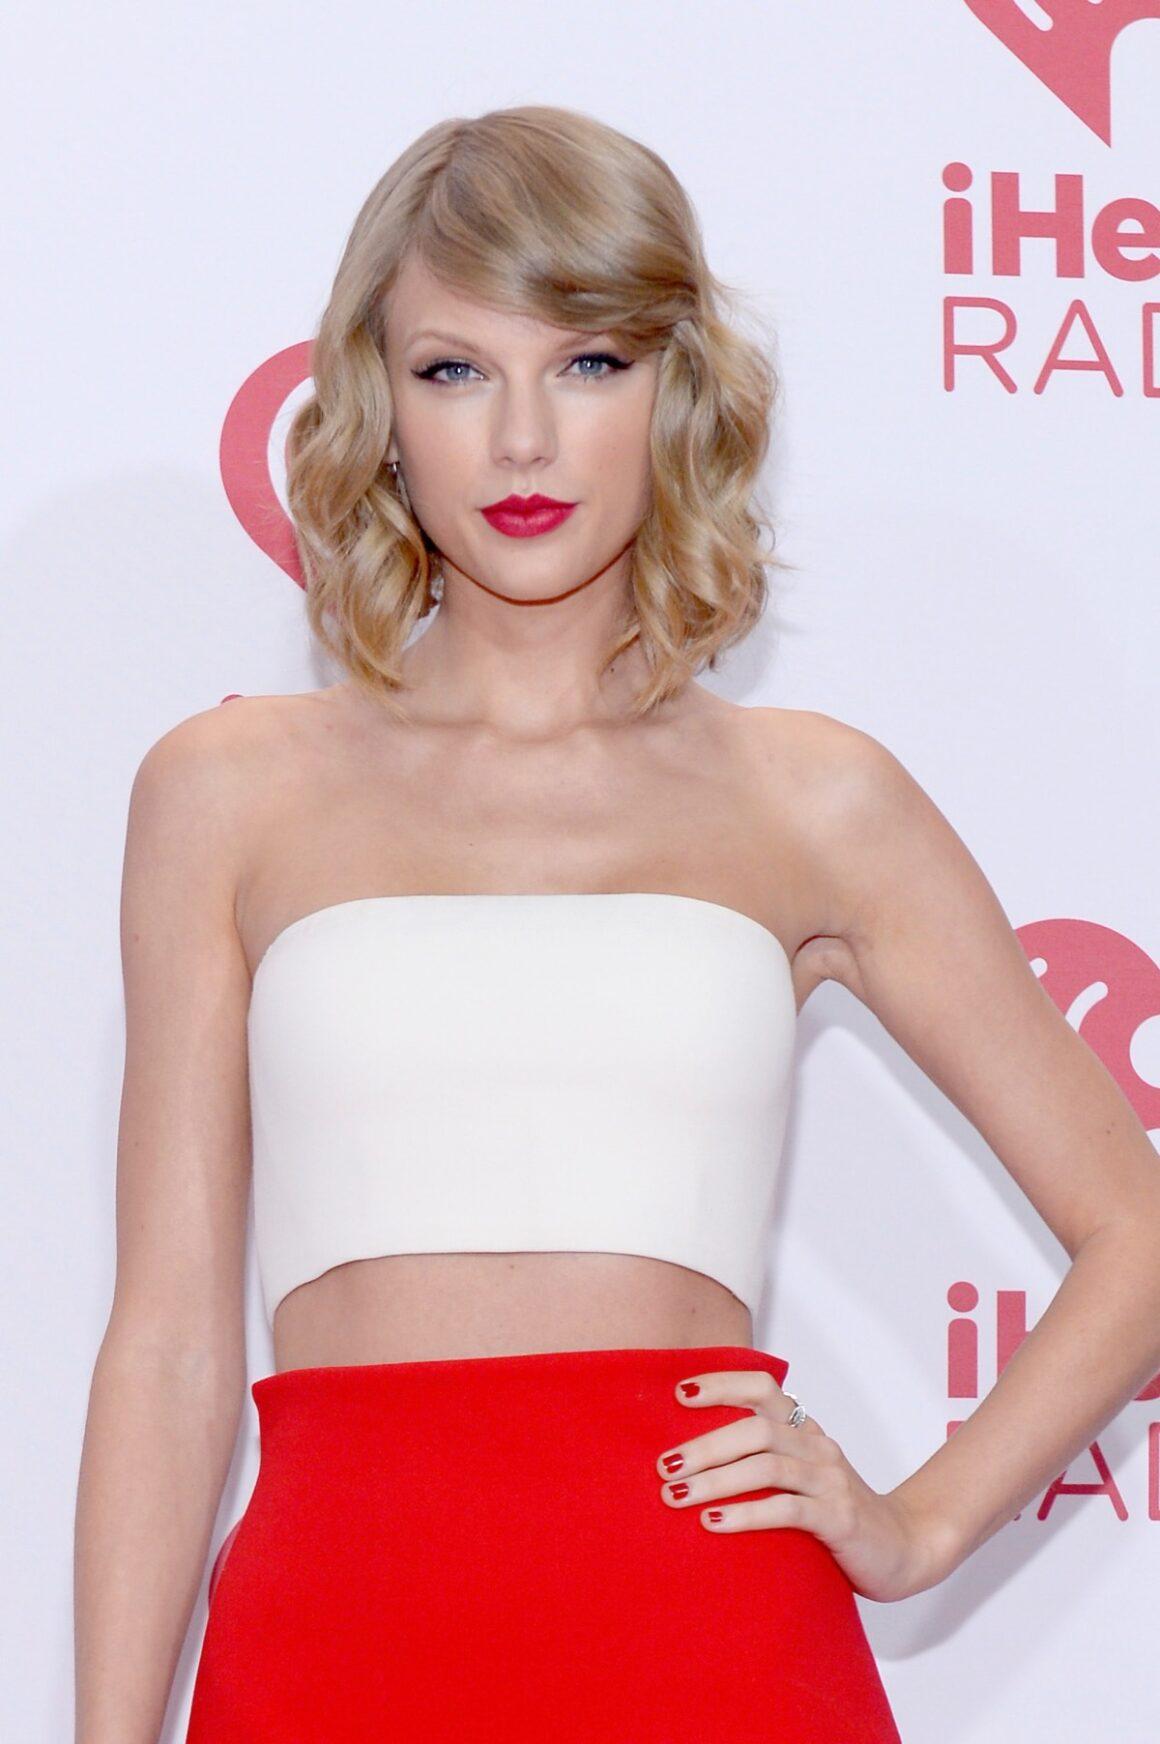 Taylor Swift 2014 iHeartRadio Music Festival - Night 1 - Backstage